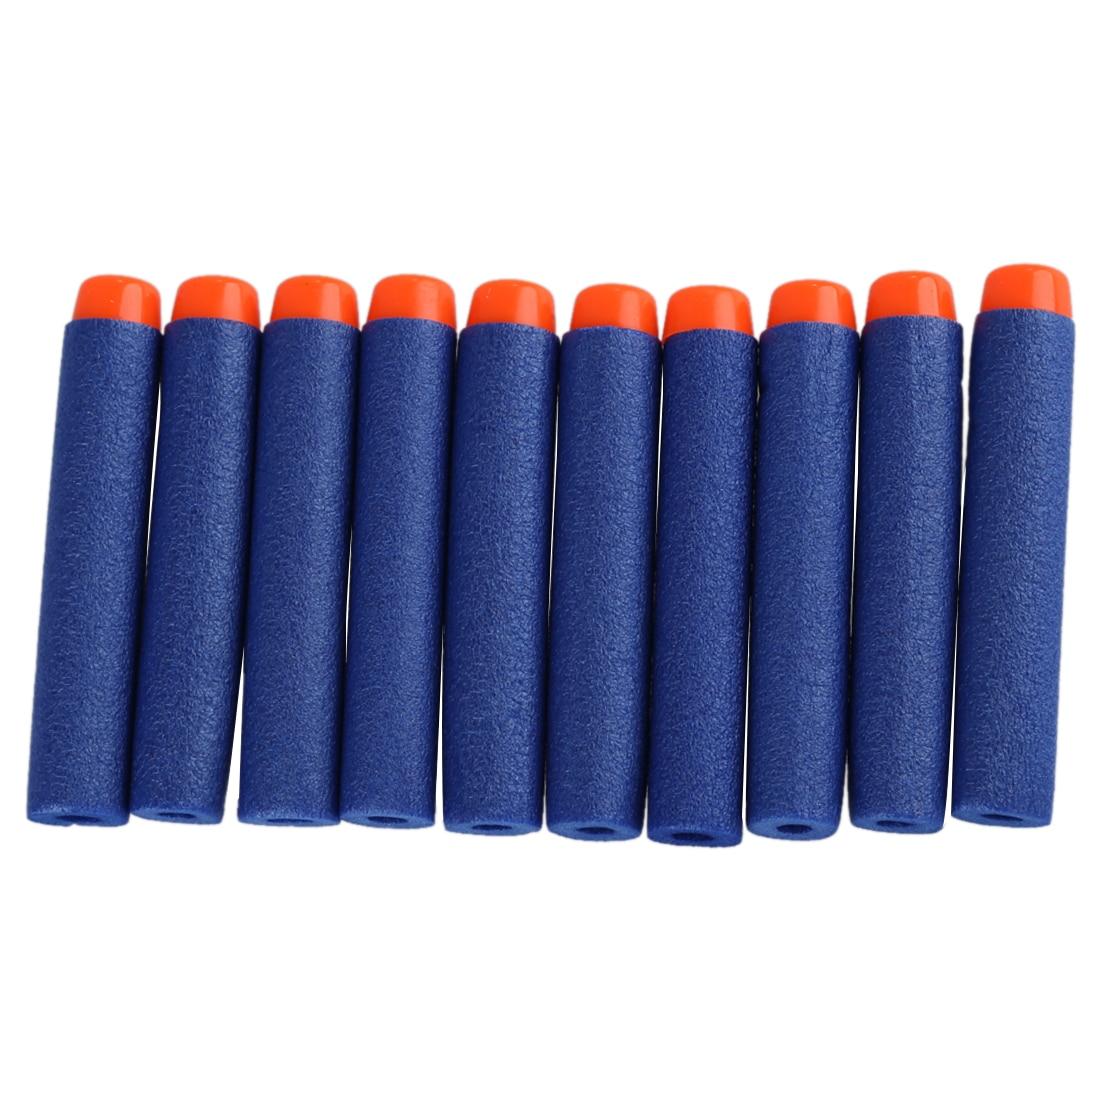 New 100pcs 7.2cm Refill Darts for Nerf N-strike Series Blasters Kid Toy Gun-blue ...